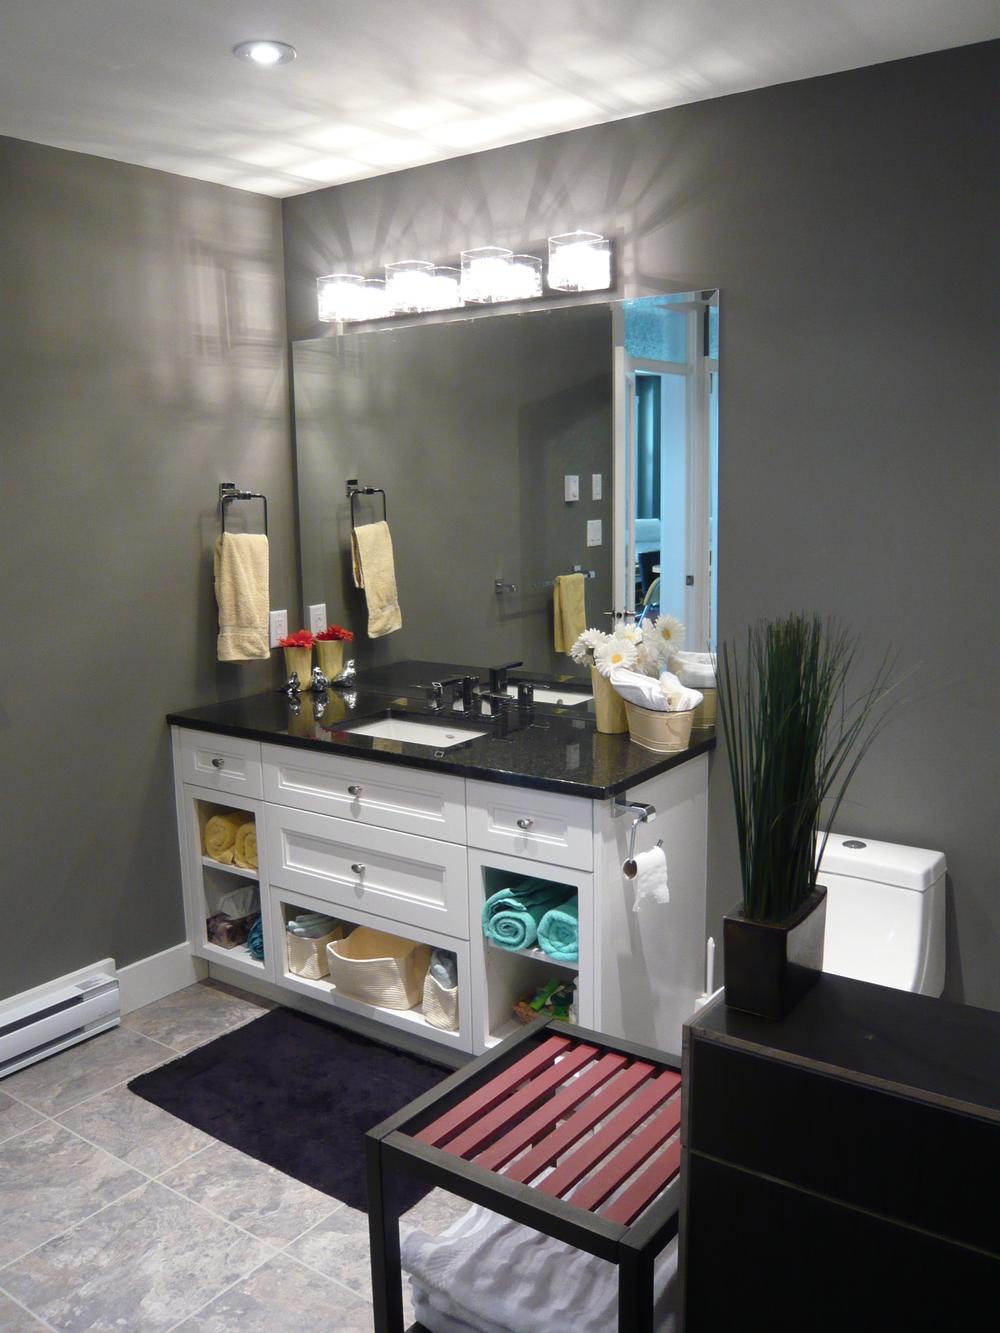 Basement-Suite-Bathroom-Chilliwack-BC (2).JPG